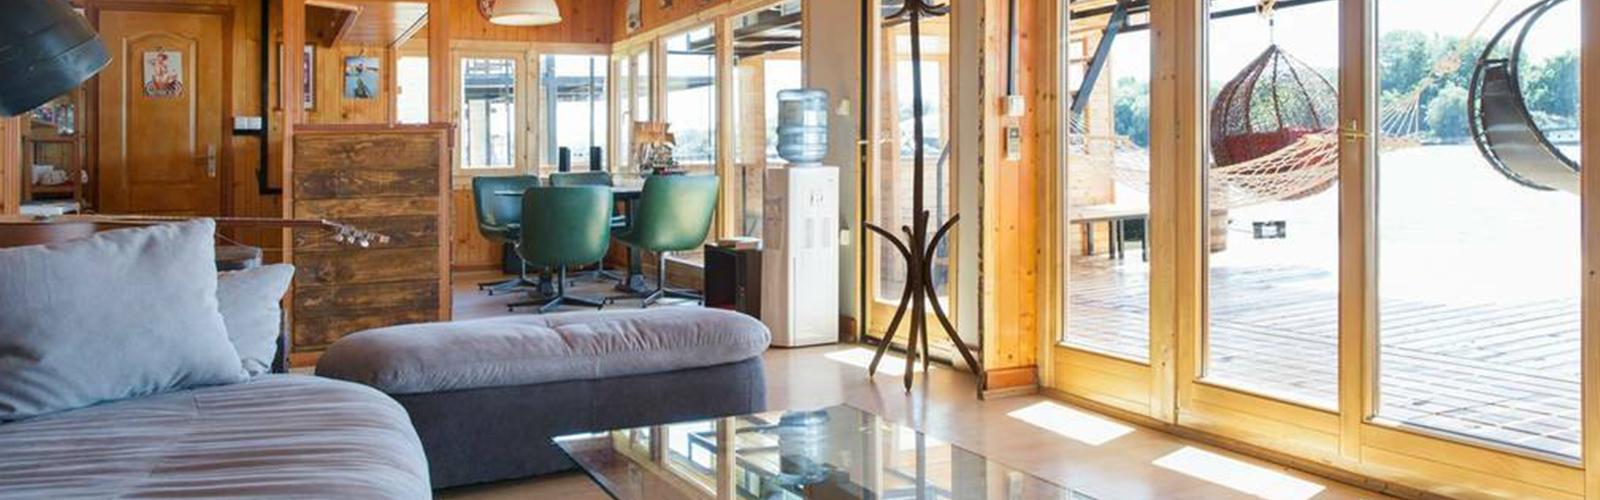 Concierge Belgrade | Apartment on the river Delta Top 7